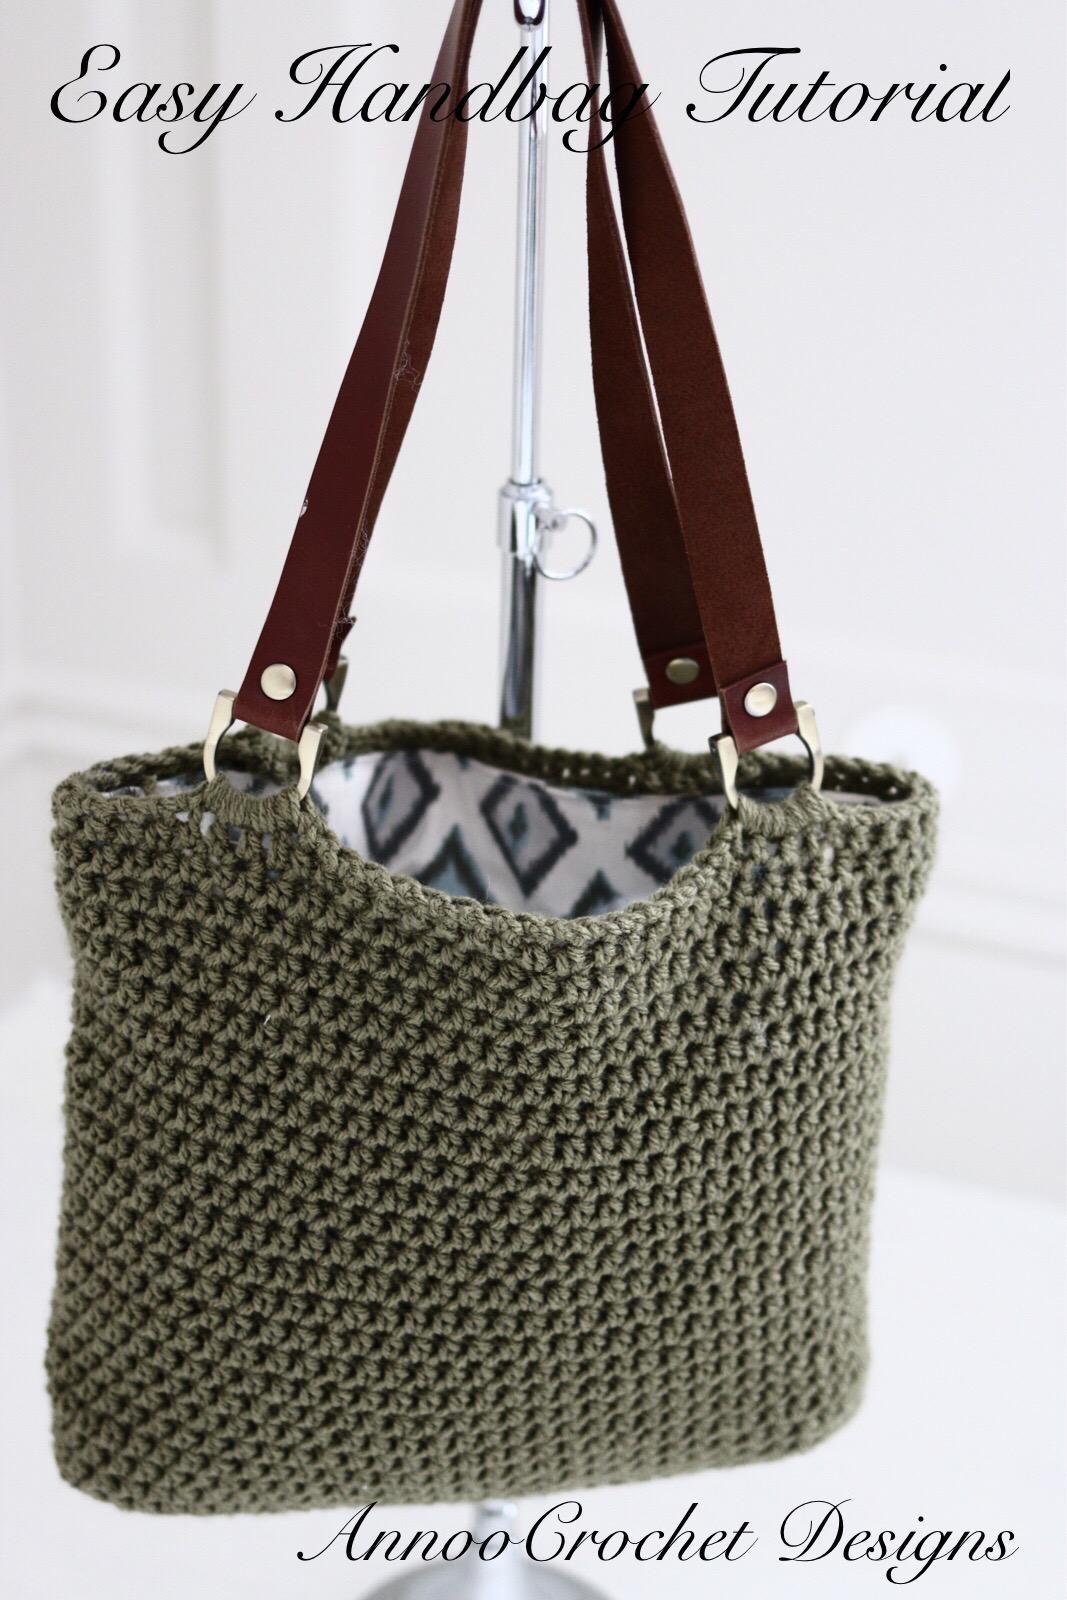 Annoos Crochet World Stylish Easy To Make Handbag Tutorial